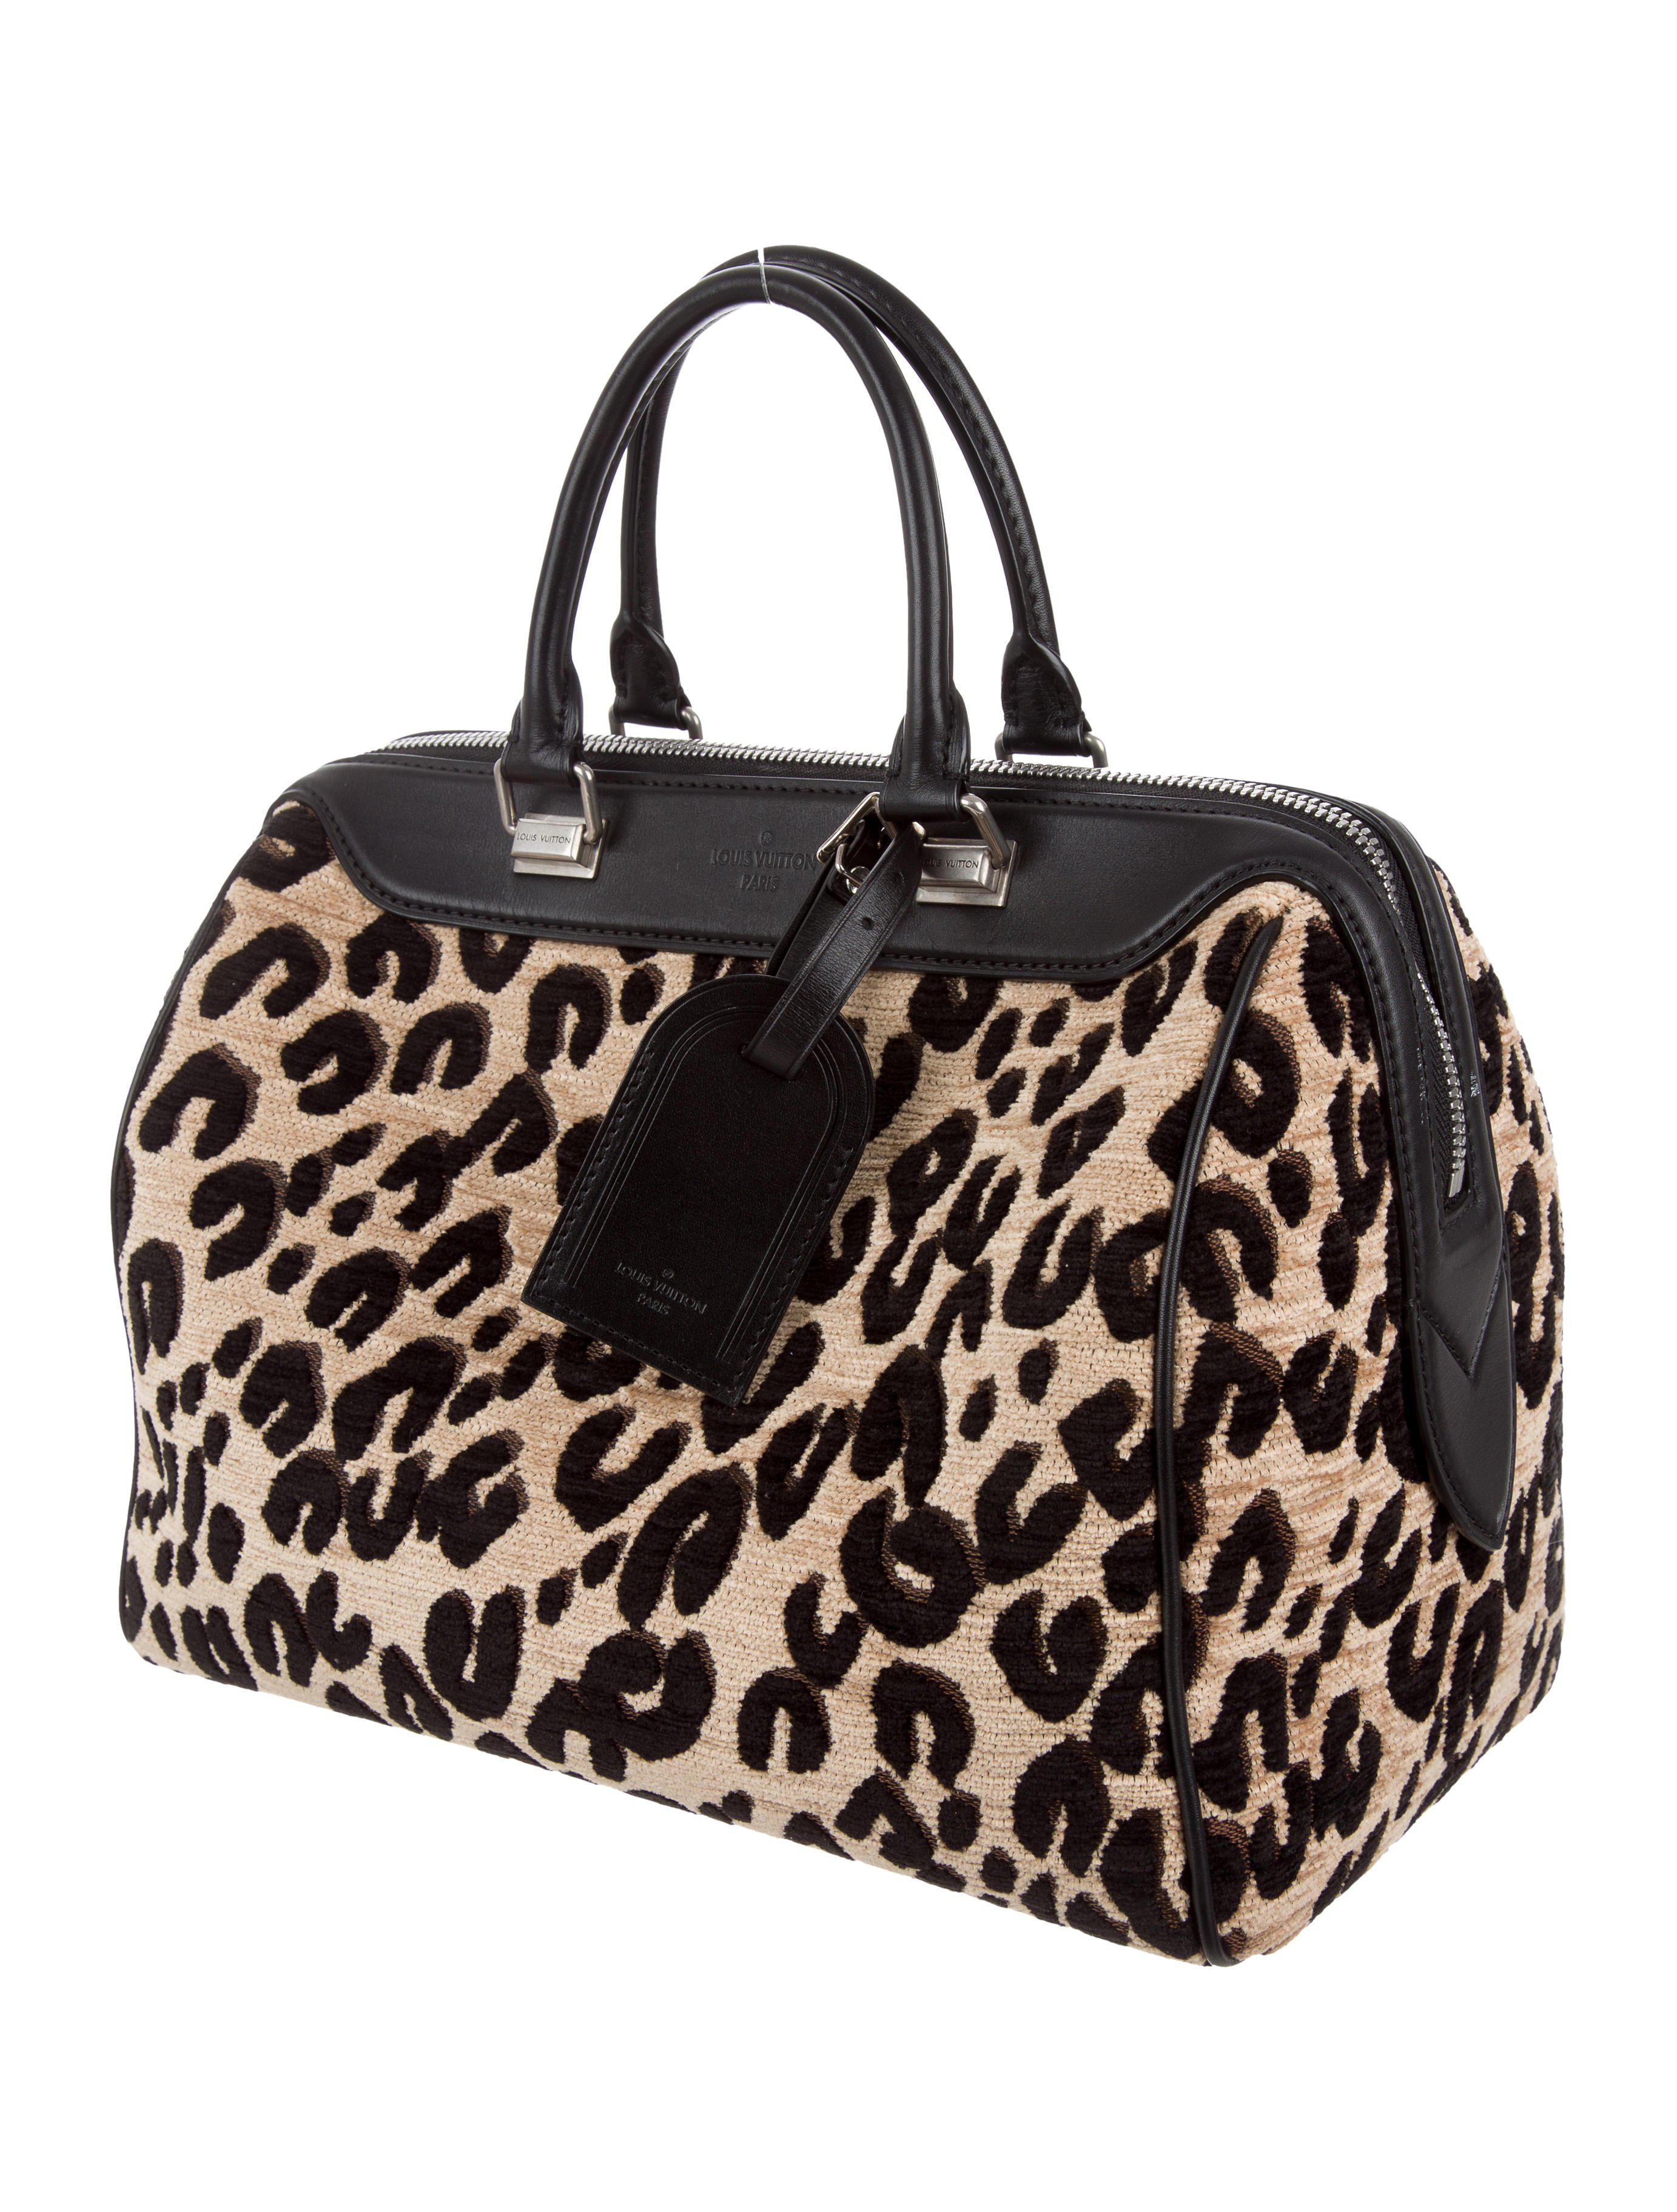 dfacb0f4aad4 Lyst - Louis Vuitton Leopard Speedy 30 in Metallic